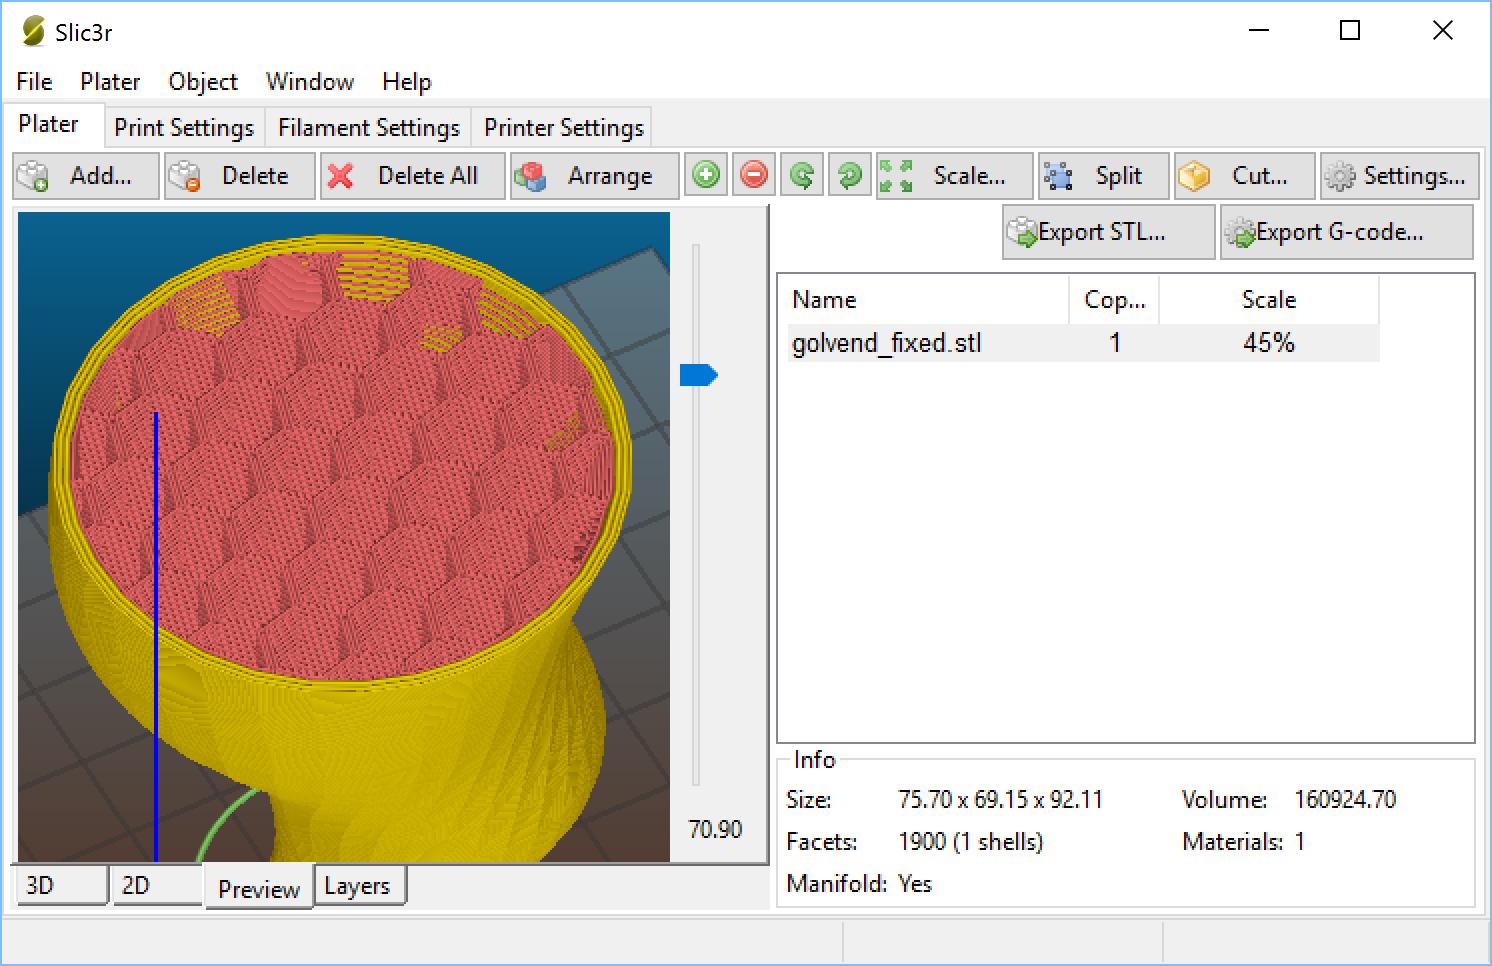 3D Printing 101 - Slicing a model - 3D Printing Professor